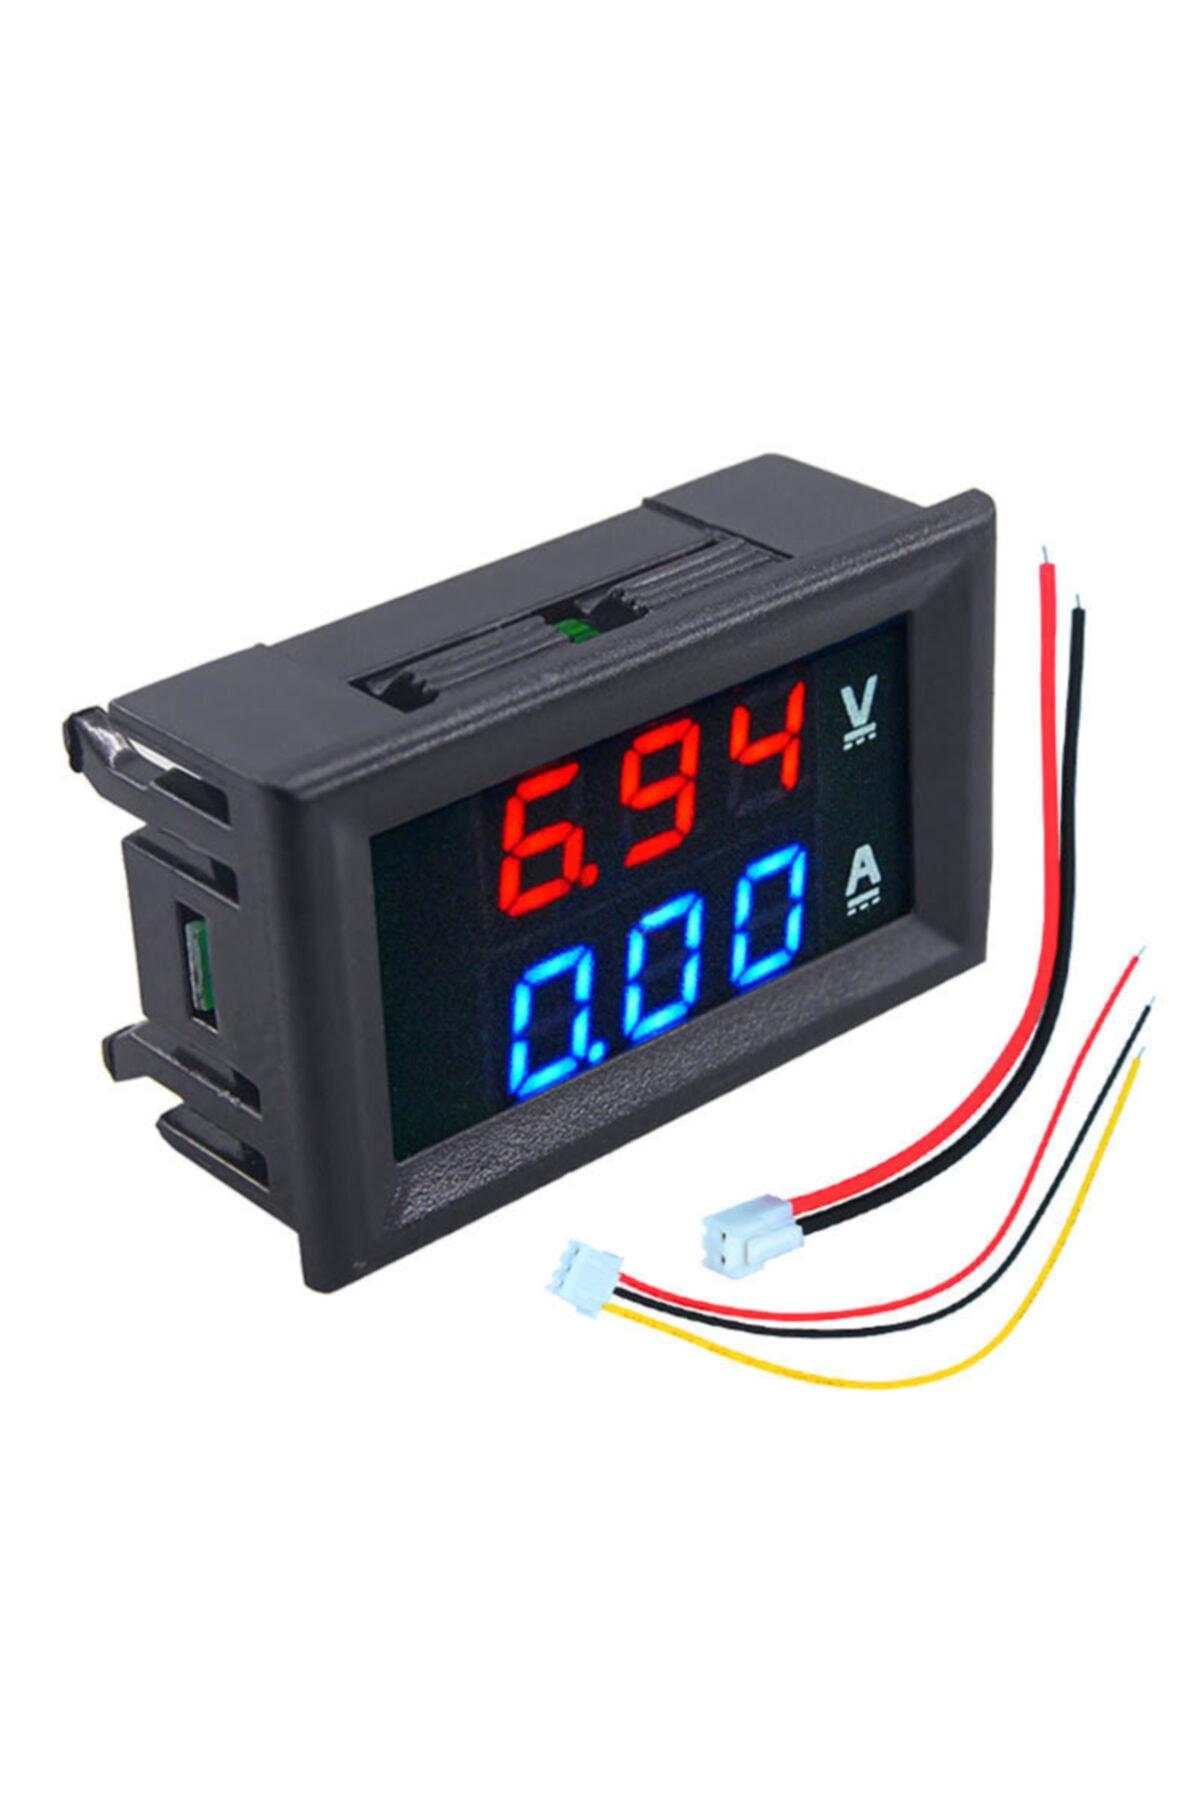 BAKAY Dijital Ampermetre 0-10a Voltmetre 0-30v - Kasalı 1